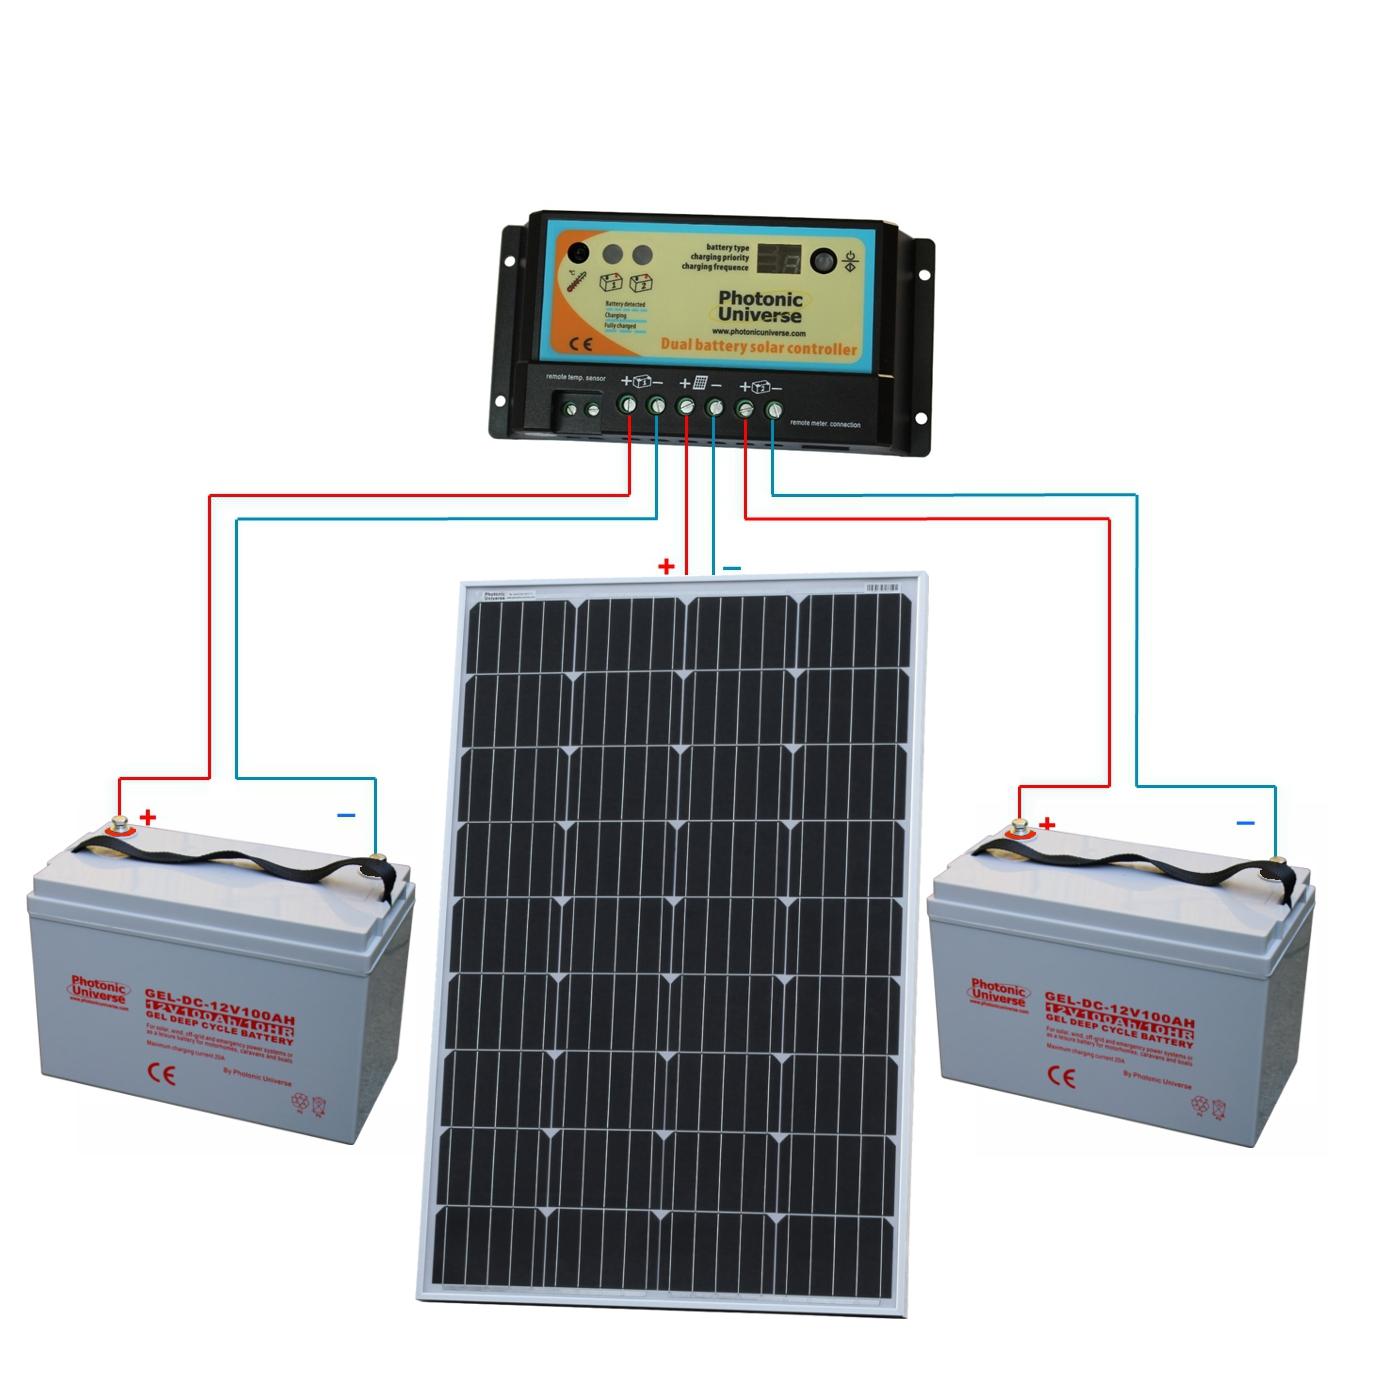 120W 12V dual battery solar panel charging kit for motorhome/camper ...